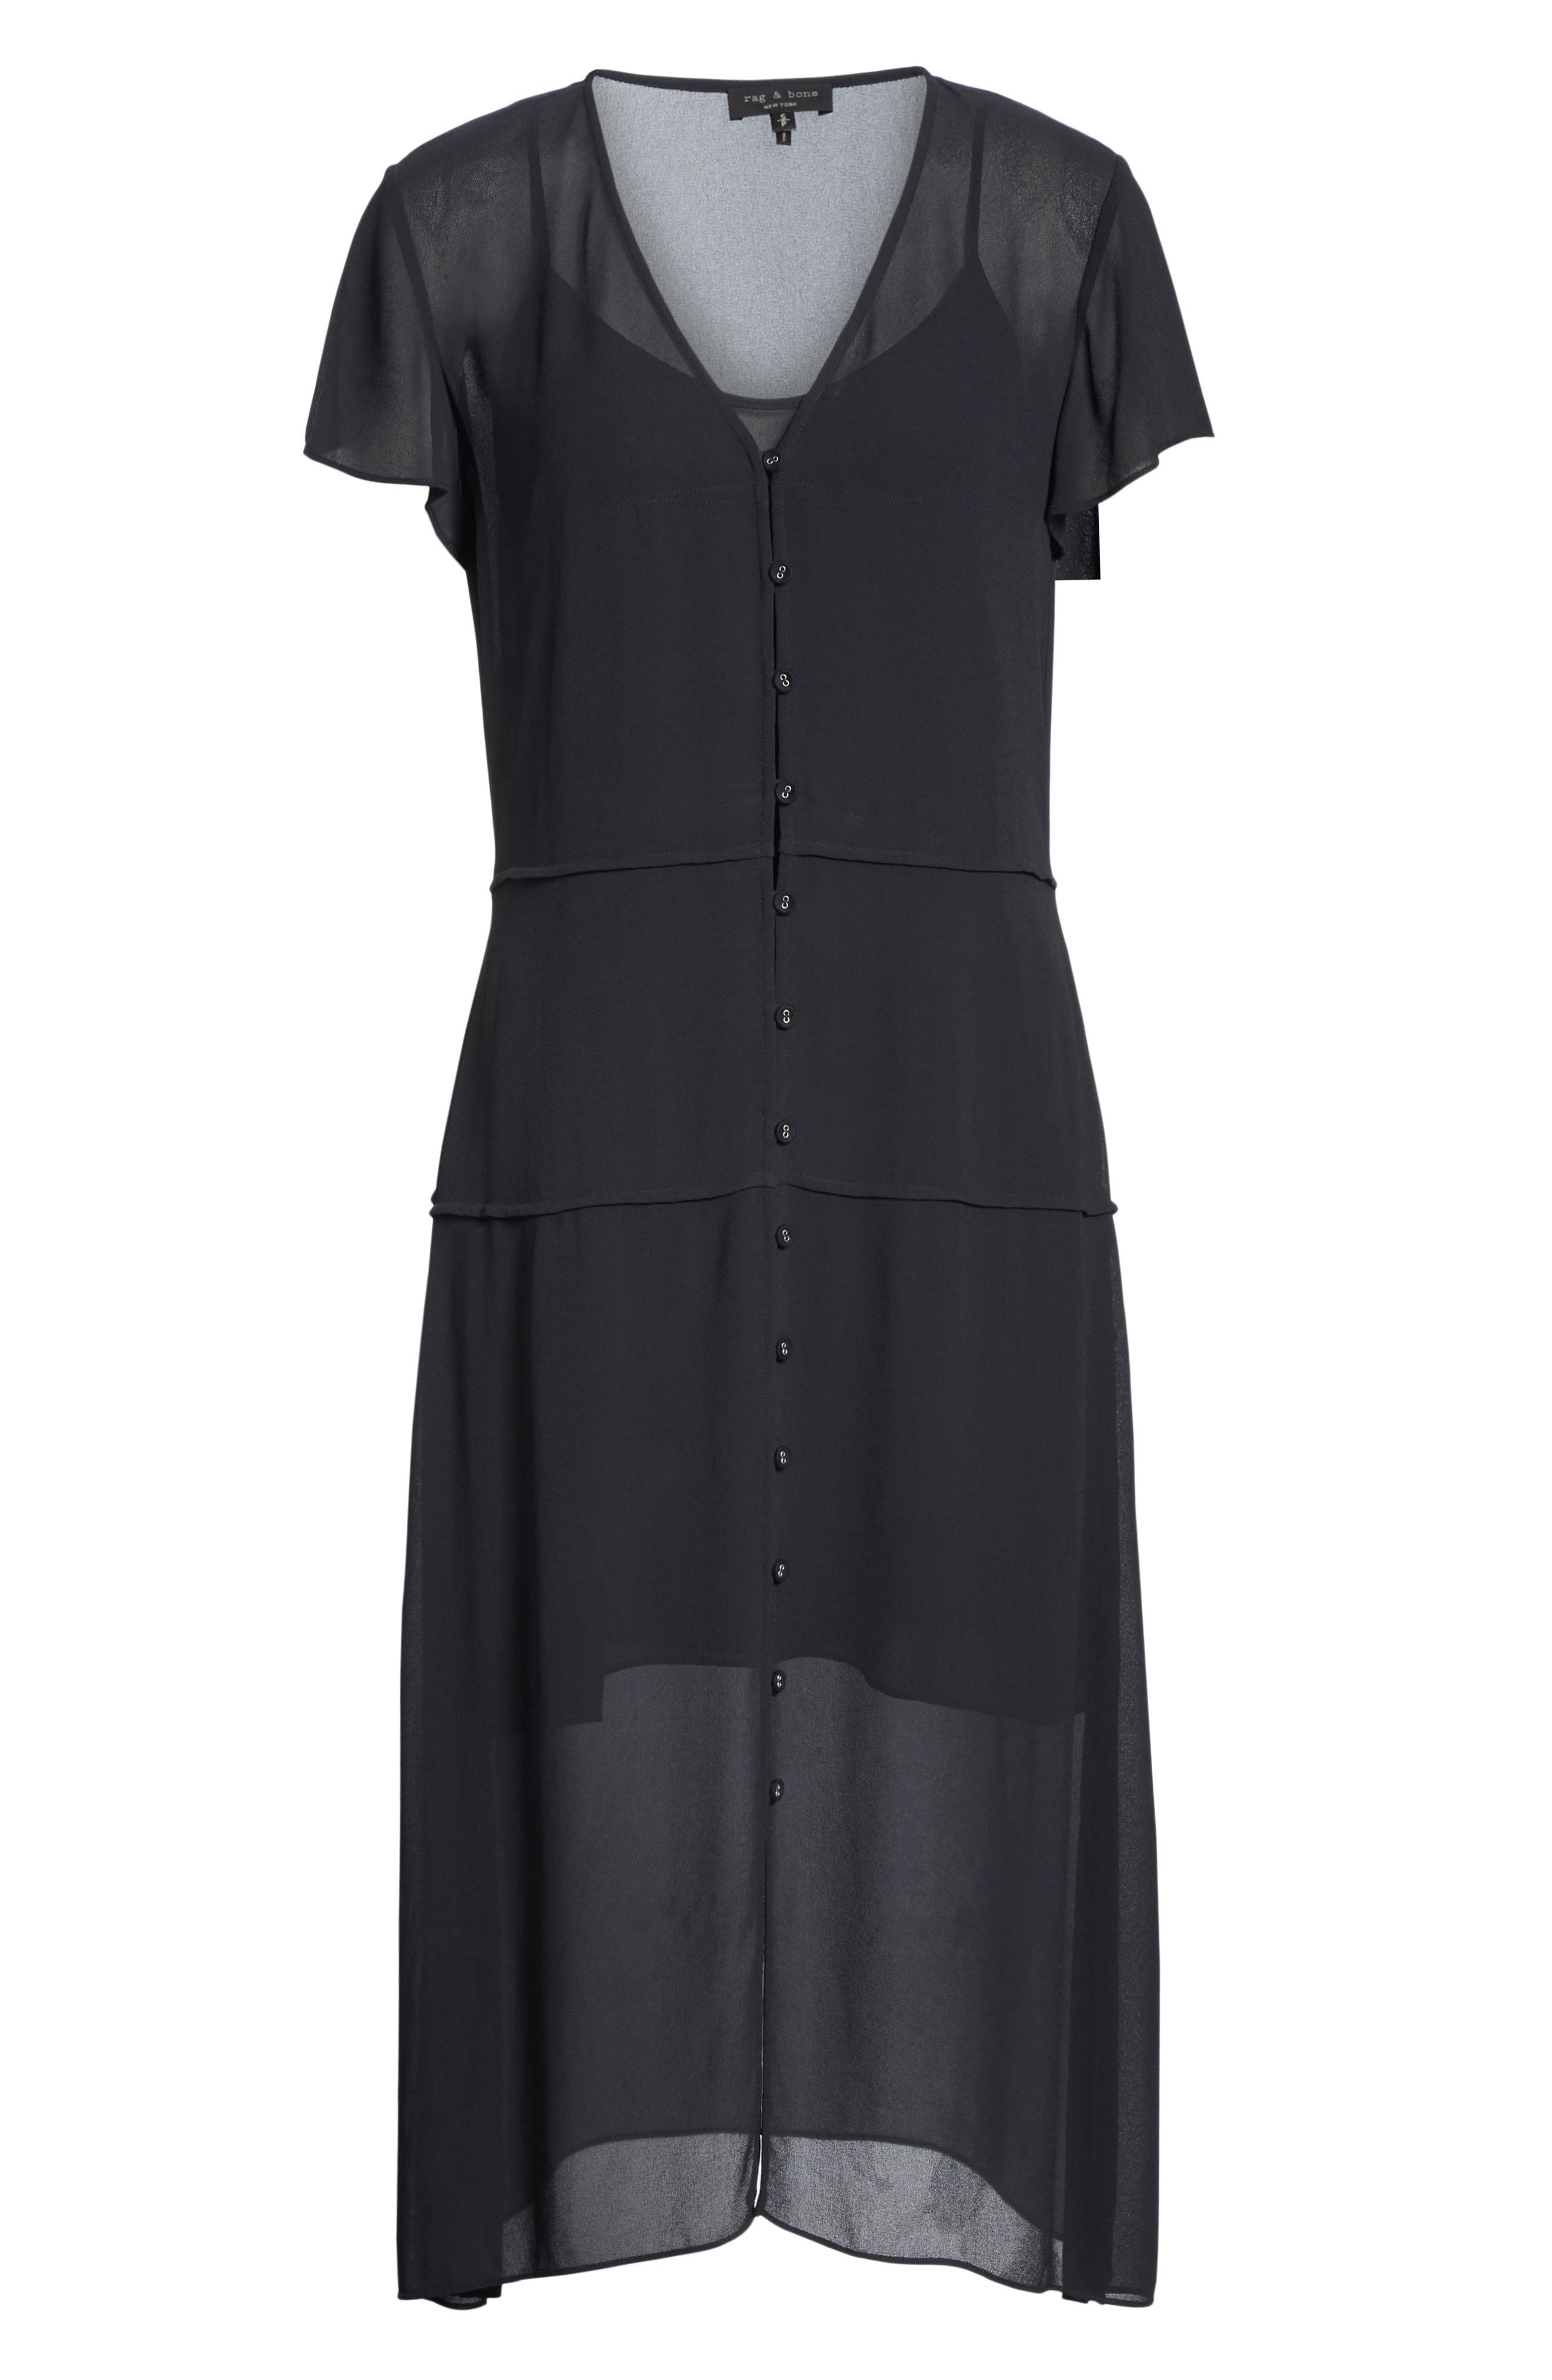 McCormick Dress,                             Alternate thumbnail 6, color,                             001